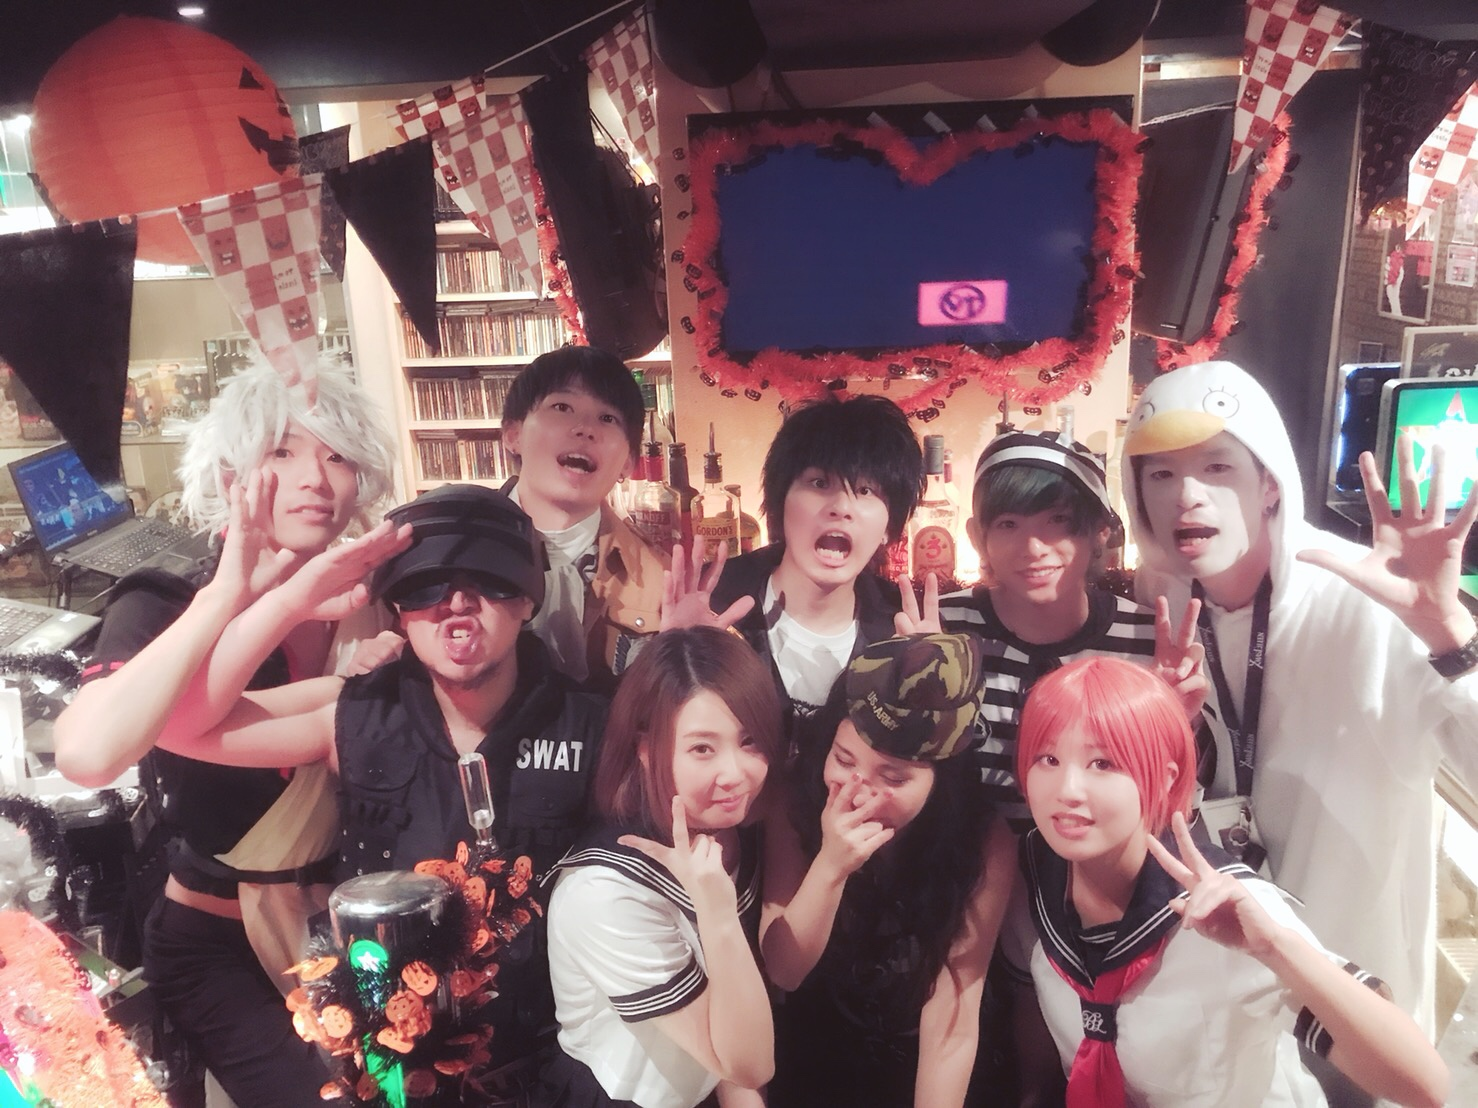 https://bar-rockaholic.jp/shibuya/blog/A9D0609E-C4C0-494B-8F2F-F241006E70A6.jpeg